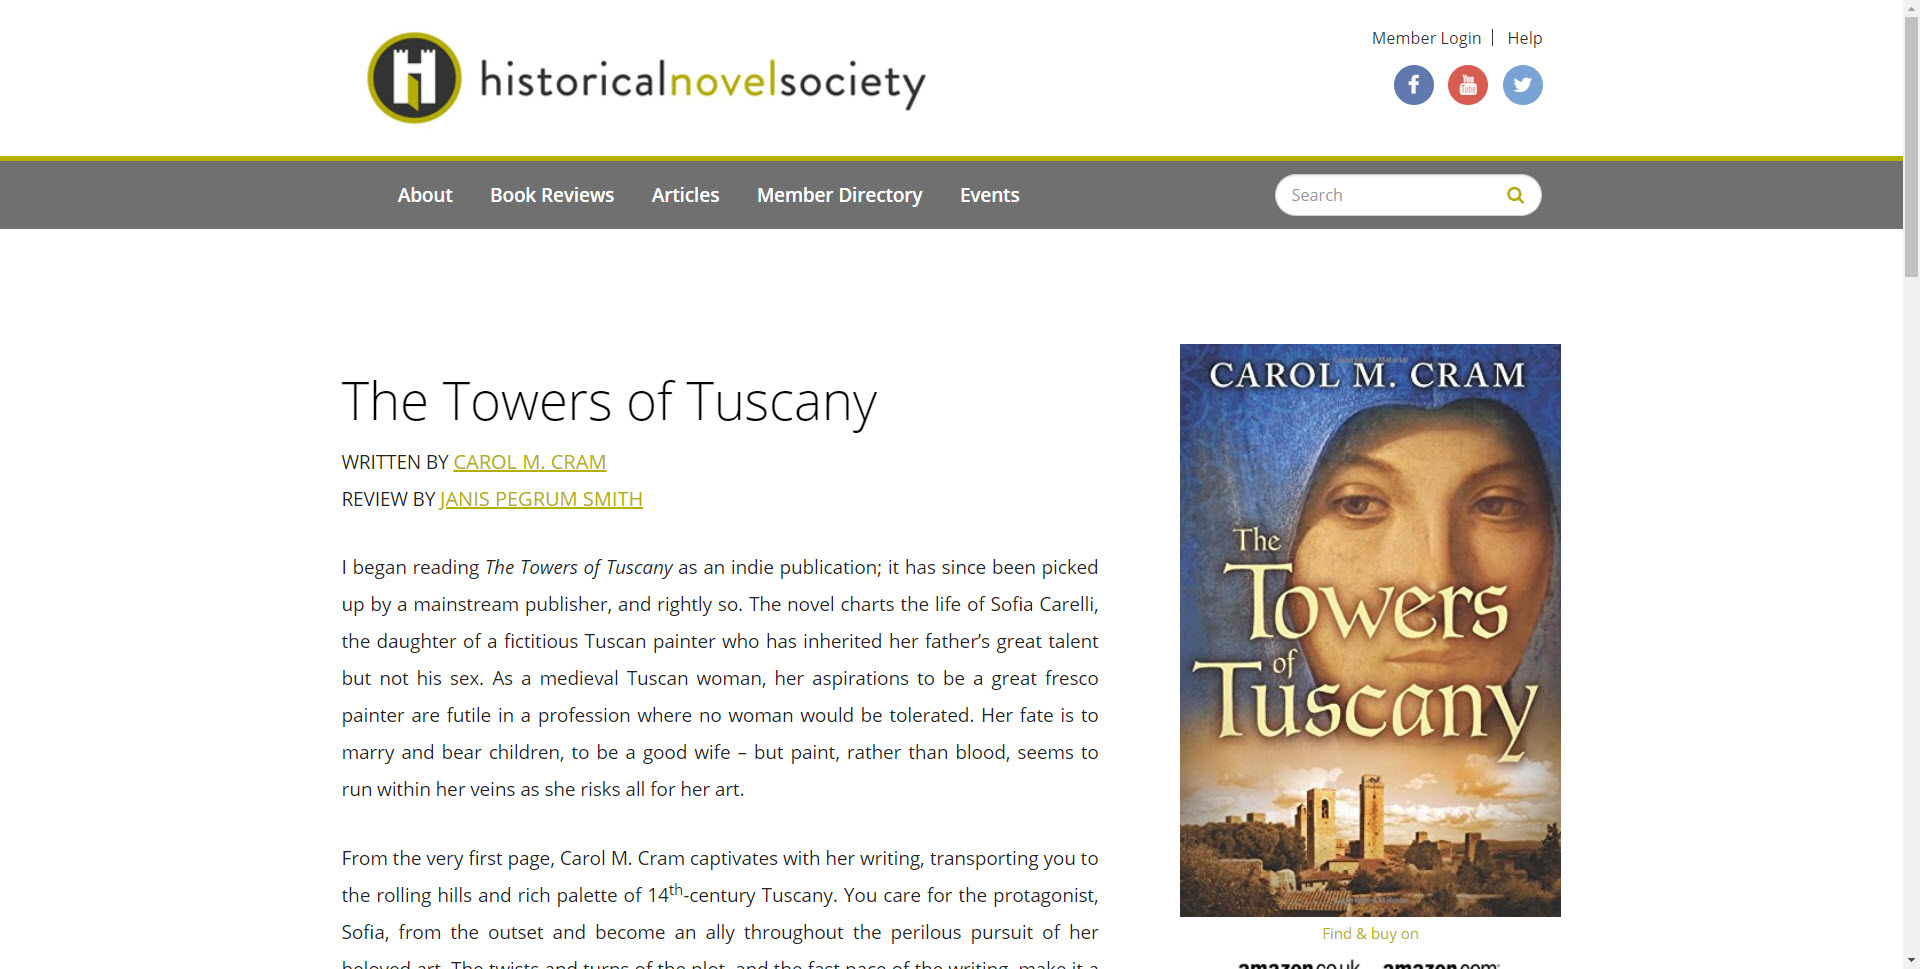 Historical Novel Society Editor's Choice